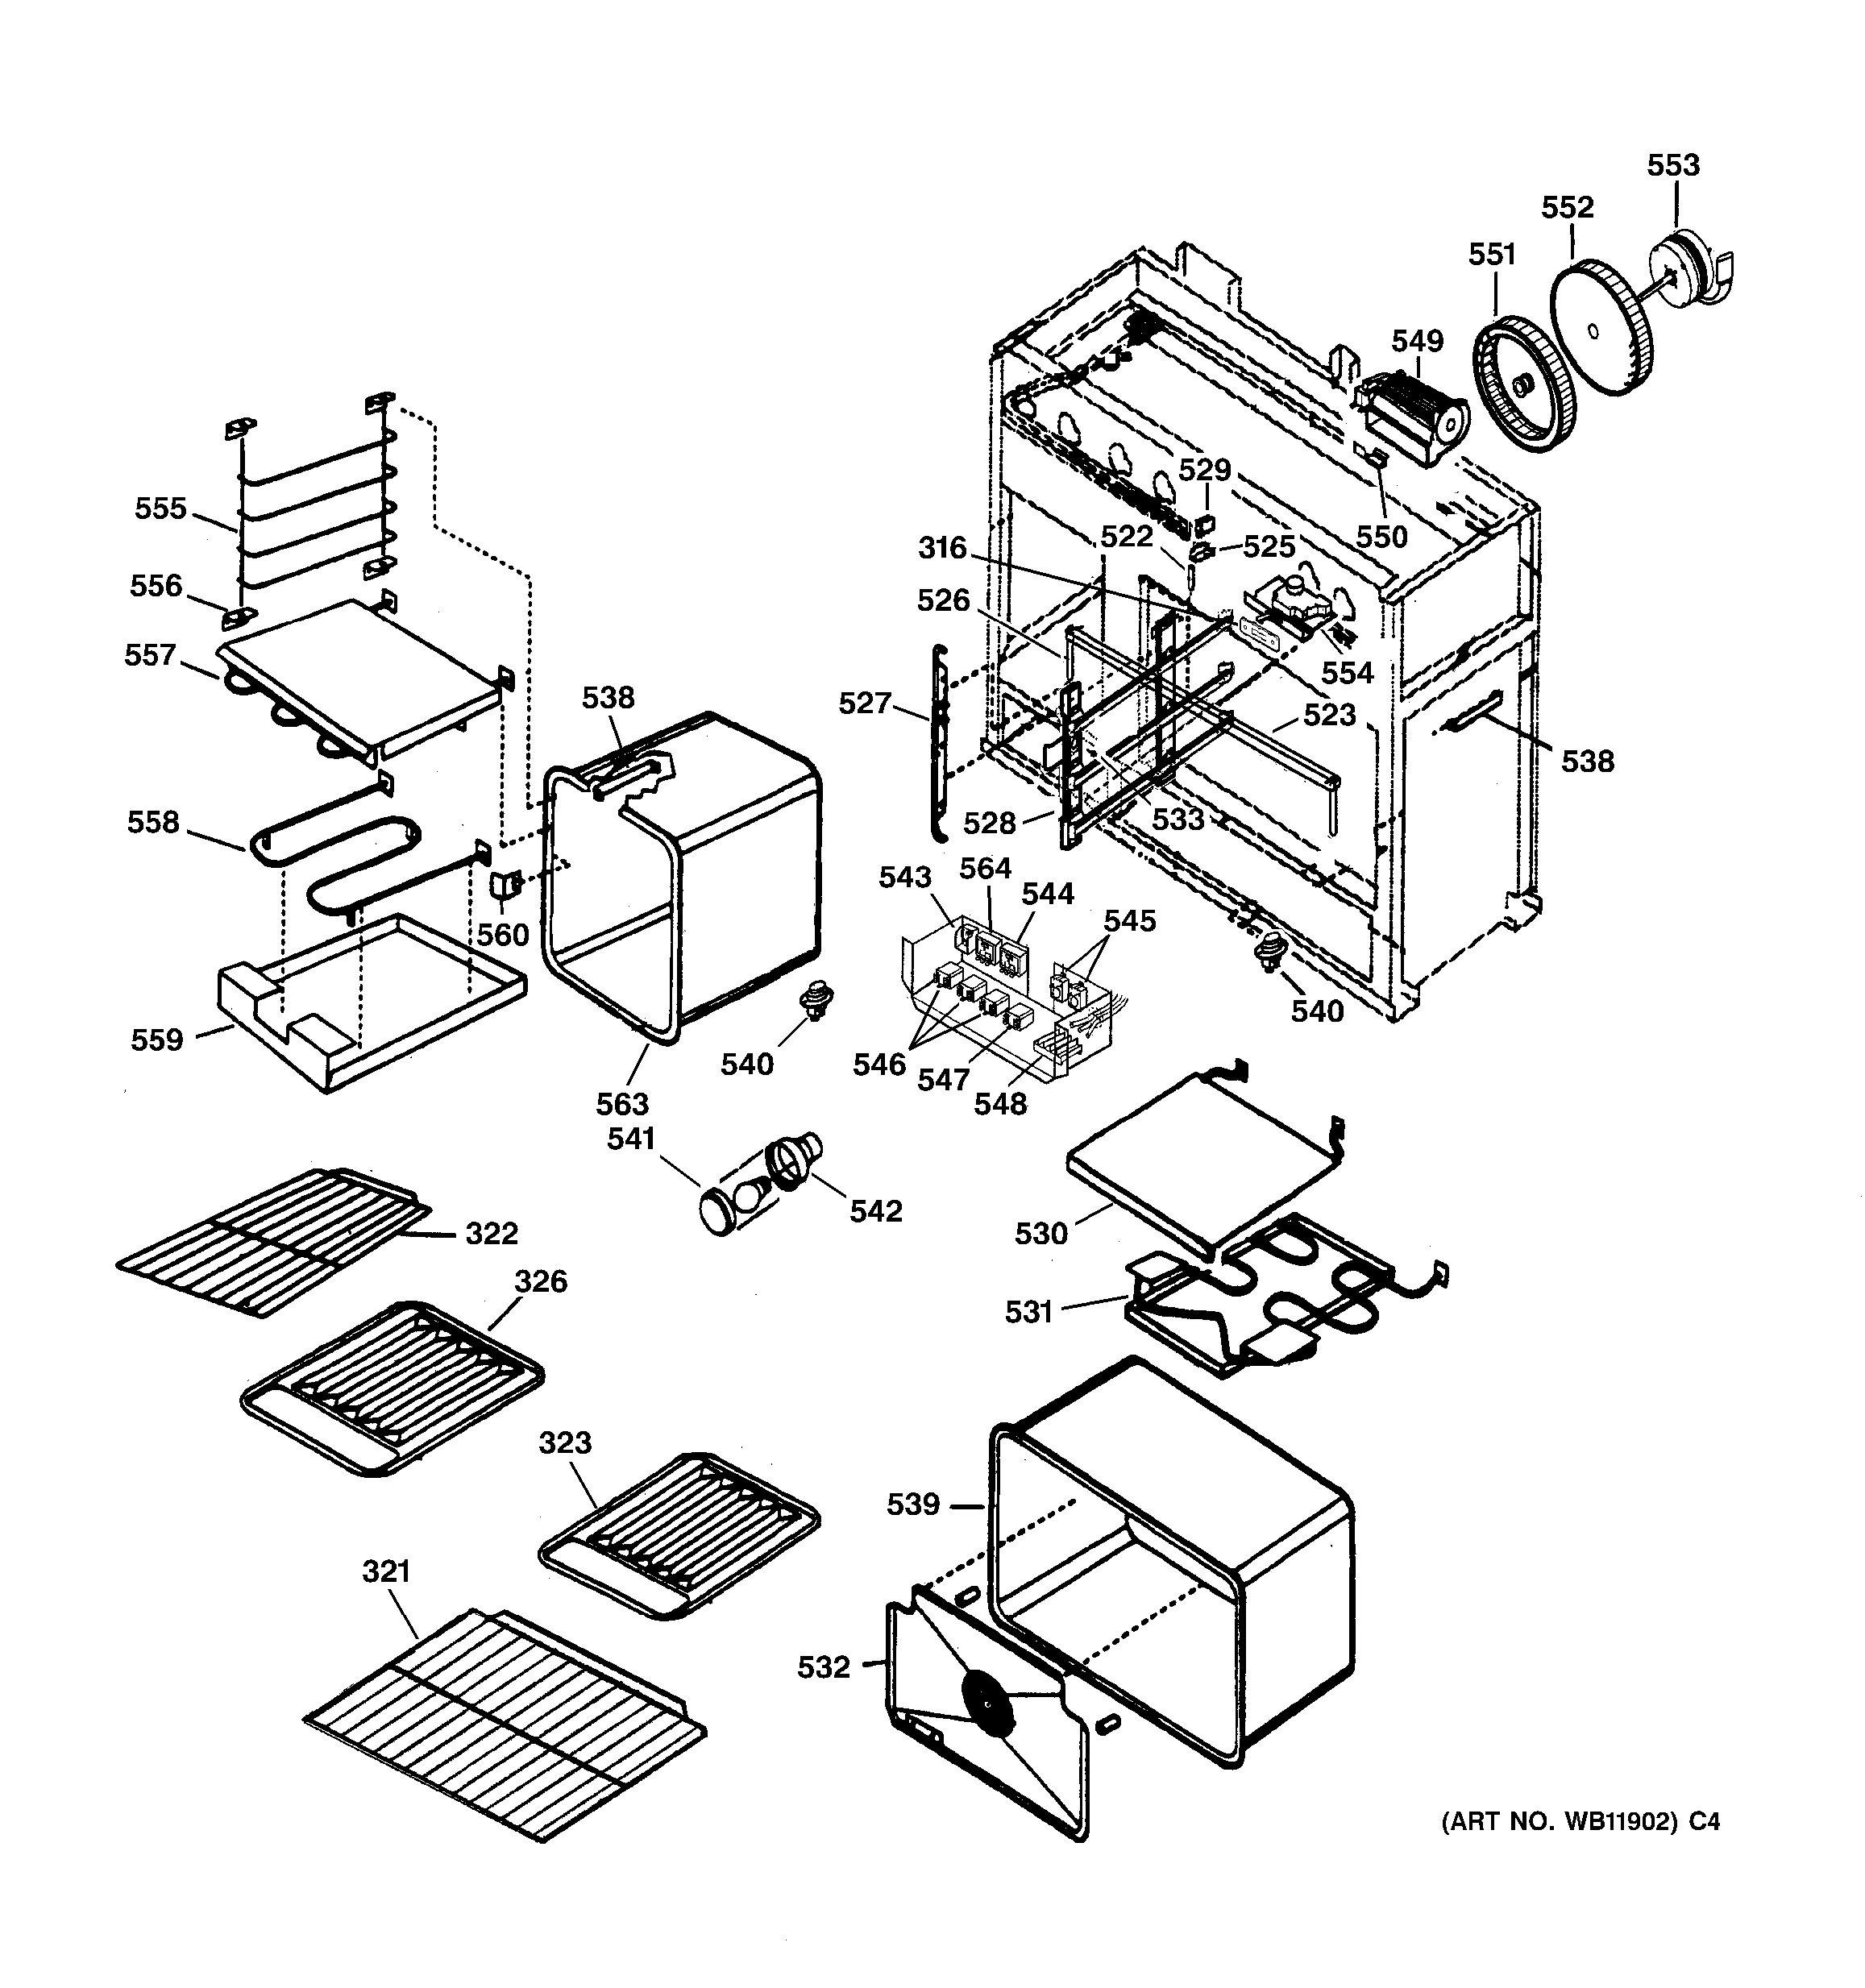 Pleasing Toaster Wiring Diagram Auto Electrical Wiring Diagram Wiring 101 Picalhutpaaxxcnl